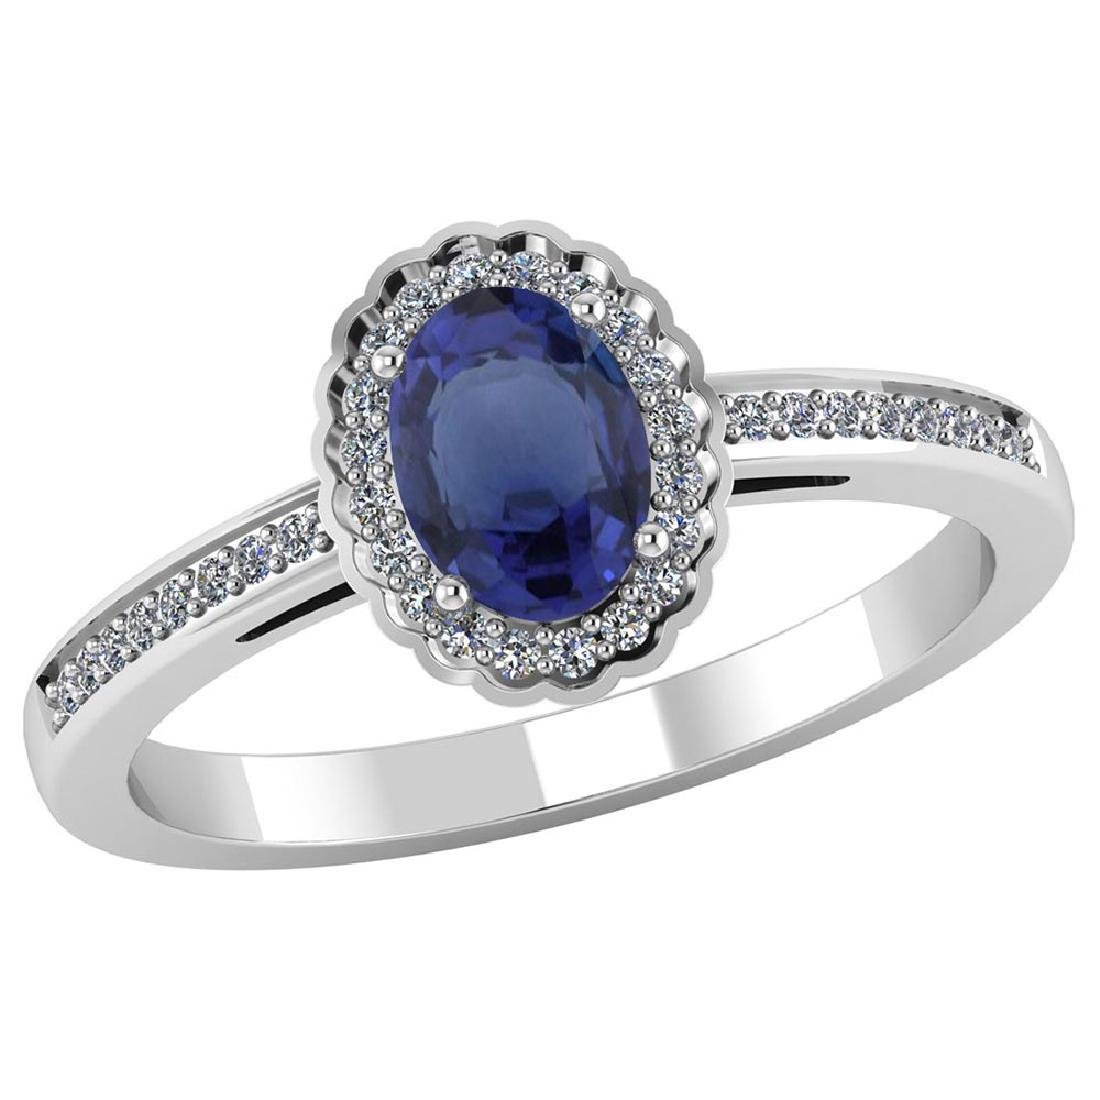 Certified 1.50 CTW Genuine Blue Sapphire And Diamond 14